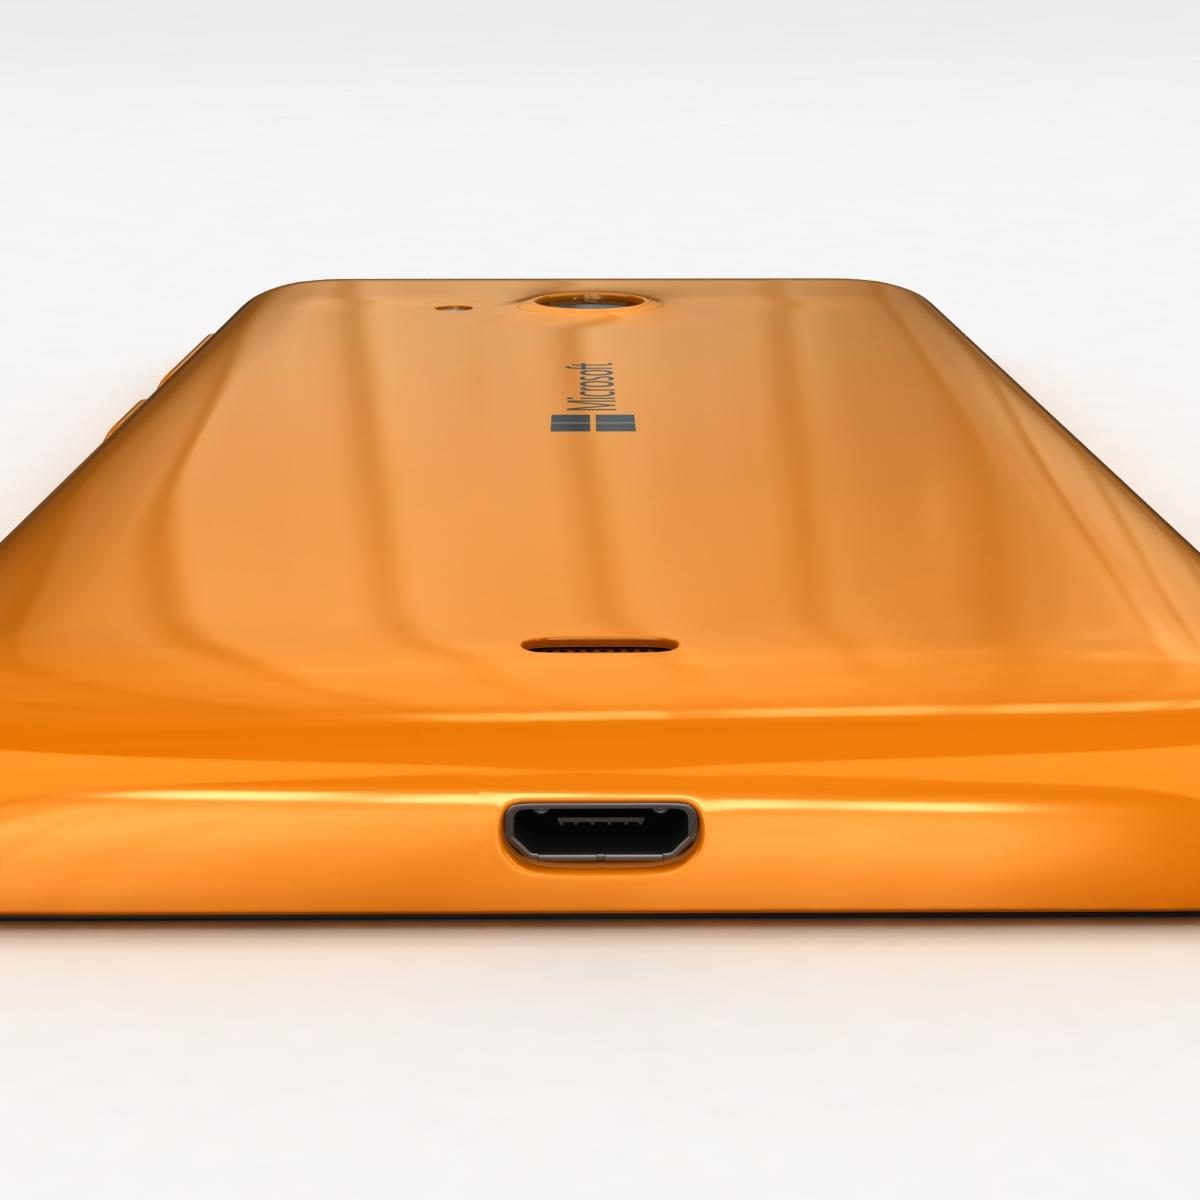 microsoft lumia 535 and dual sim orange 3d model 3ds max fbx c4d obj 204116